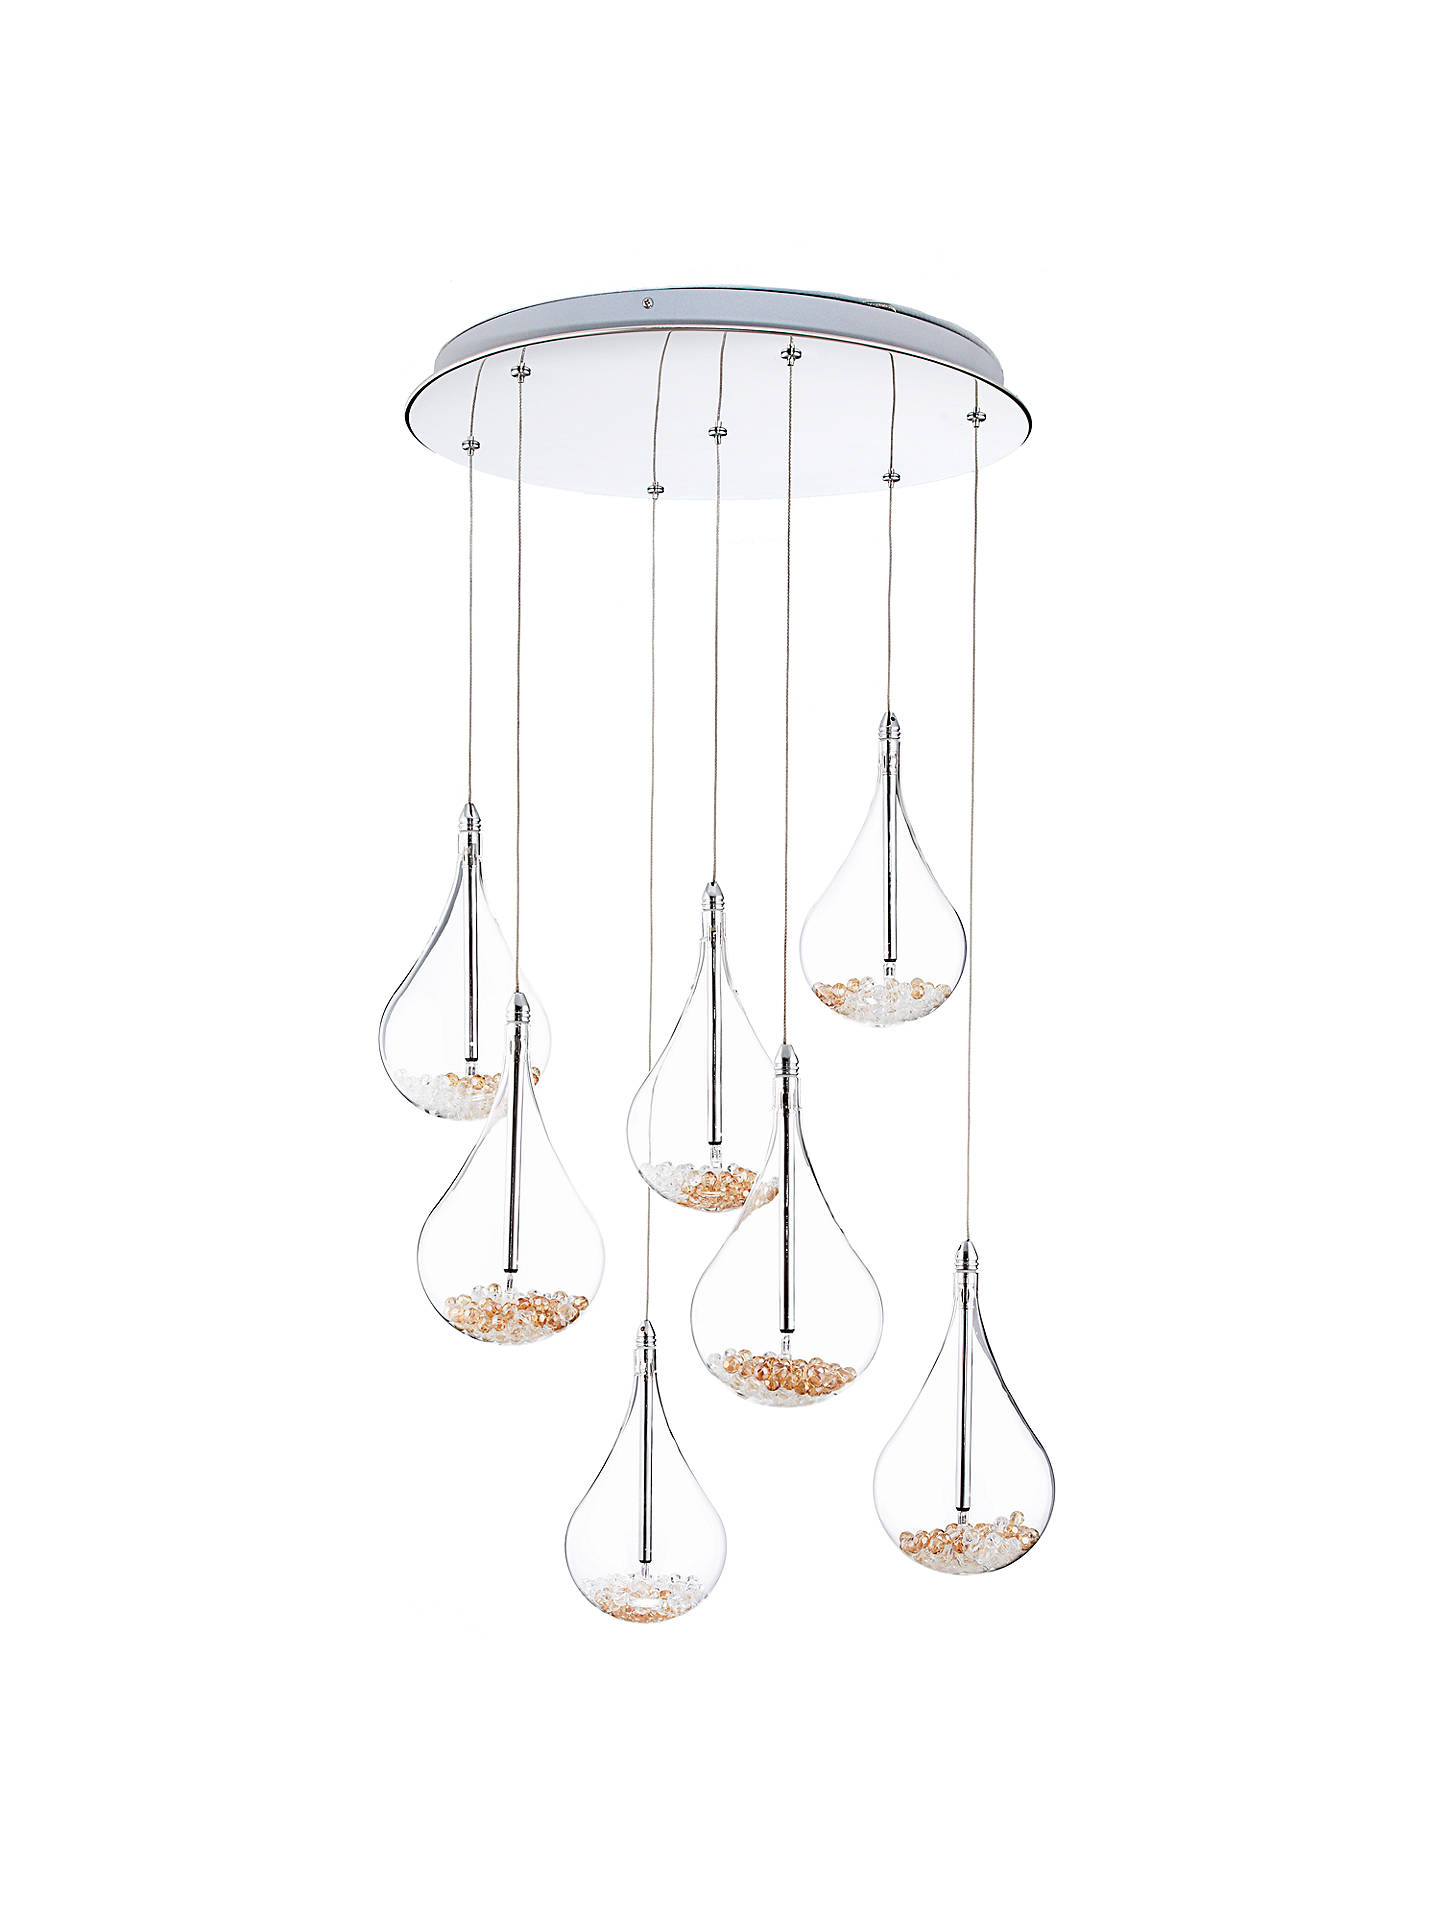 Light Lamp Dimmer 1000w Hobby Electronic Kit Circuit Board Ebay